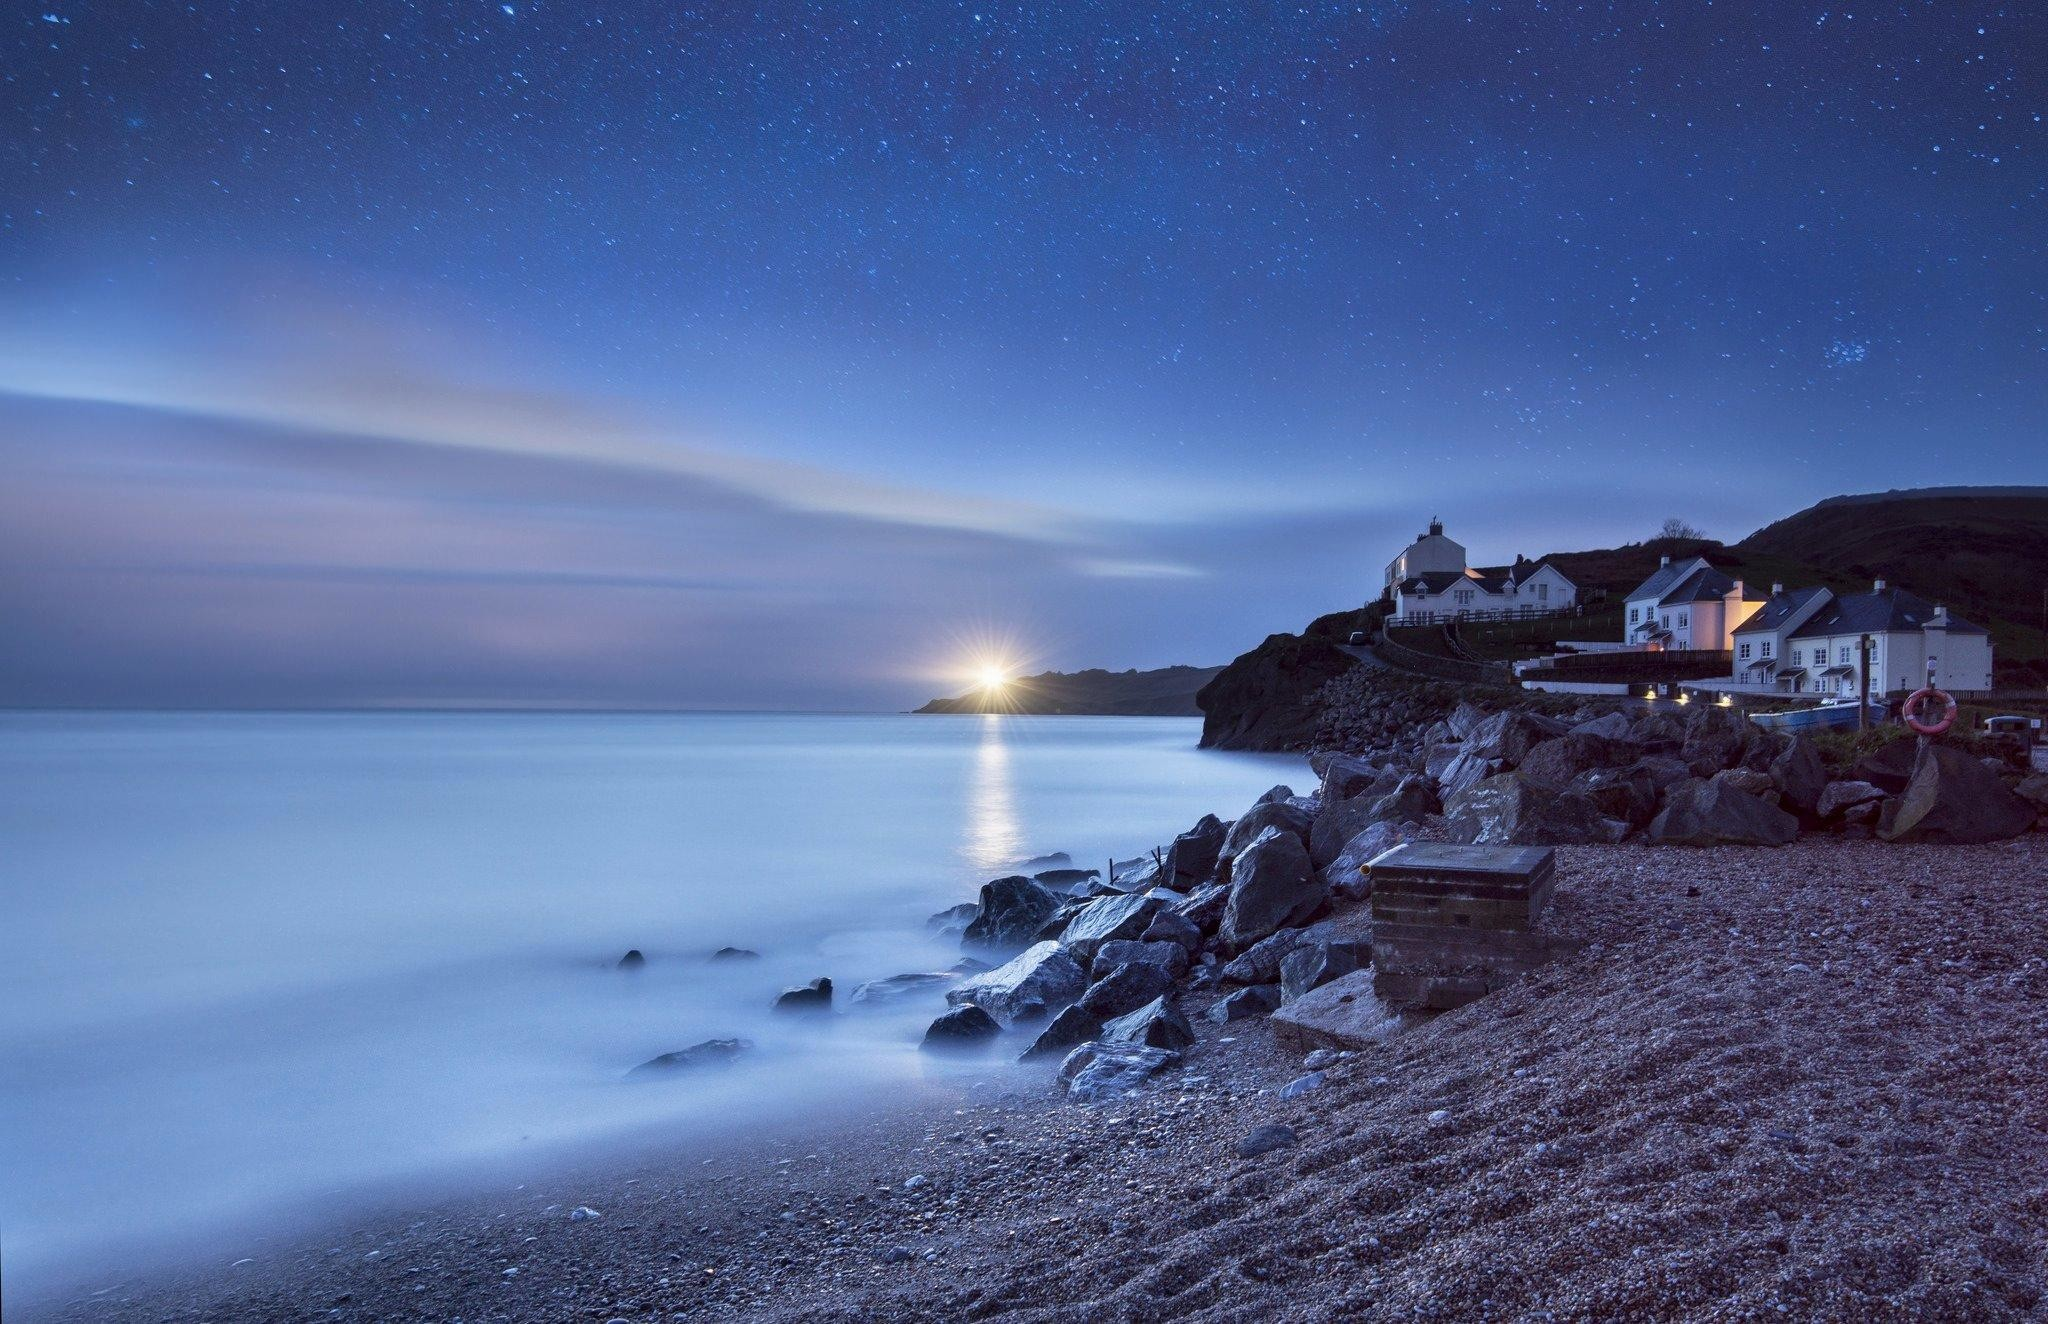 wallpaper.wiki-Free-Download-Beach-At-Night-Image-